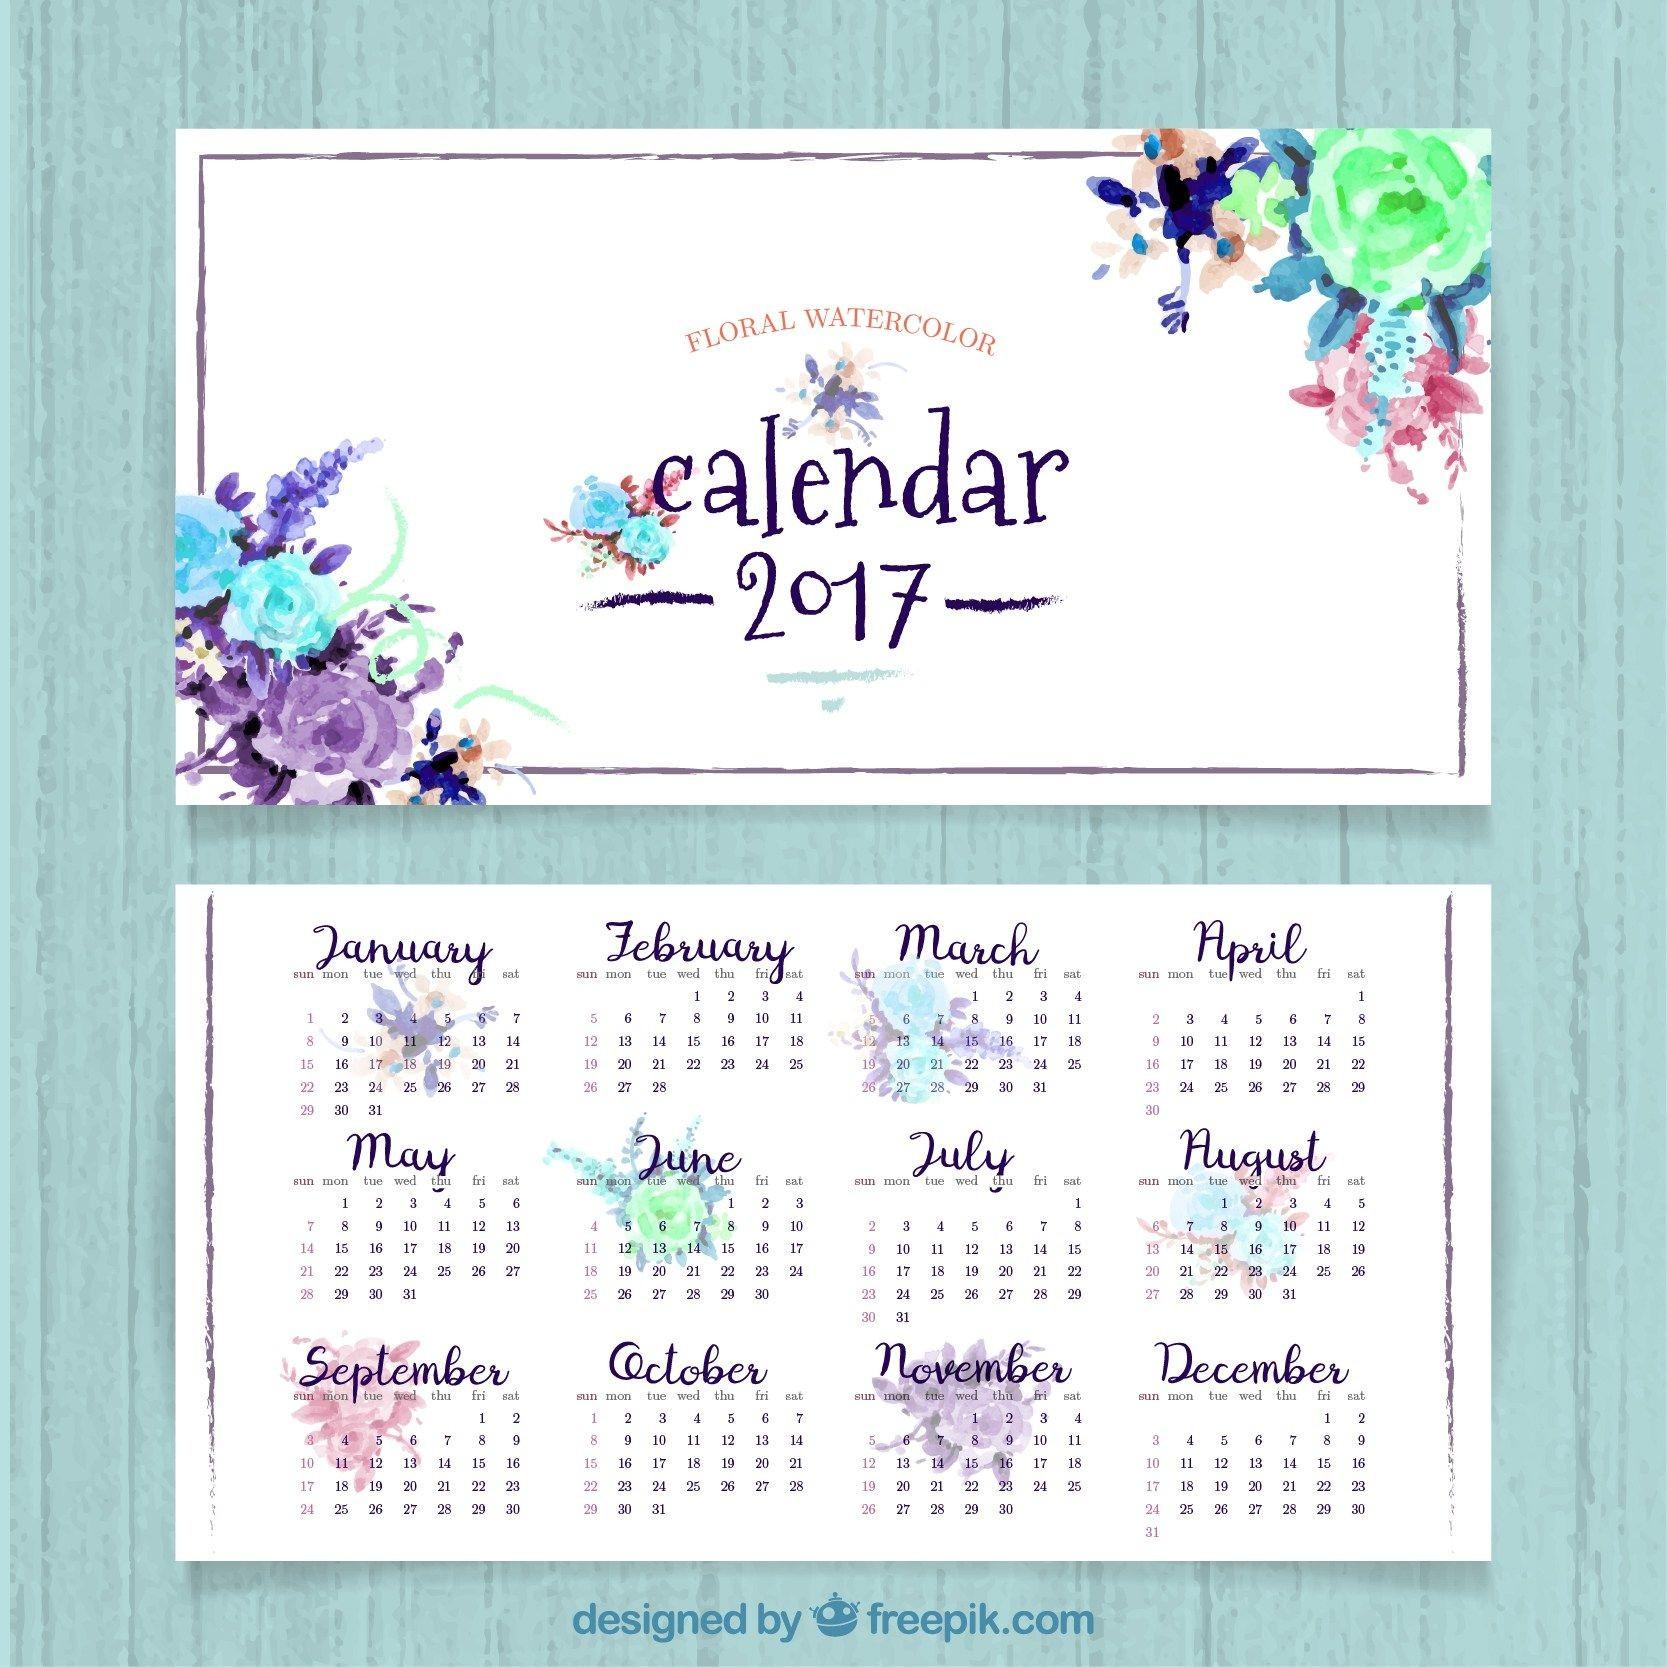 Imprimir Calendario Tumblr Más Actual Descarga Este Calendario En Vectores Para Que Puedas Imprimir Y Of Imprimir Calendario Tumblr Más Populares Crea Calendarios Personalizados Online Gratis Con Canva